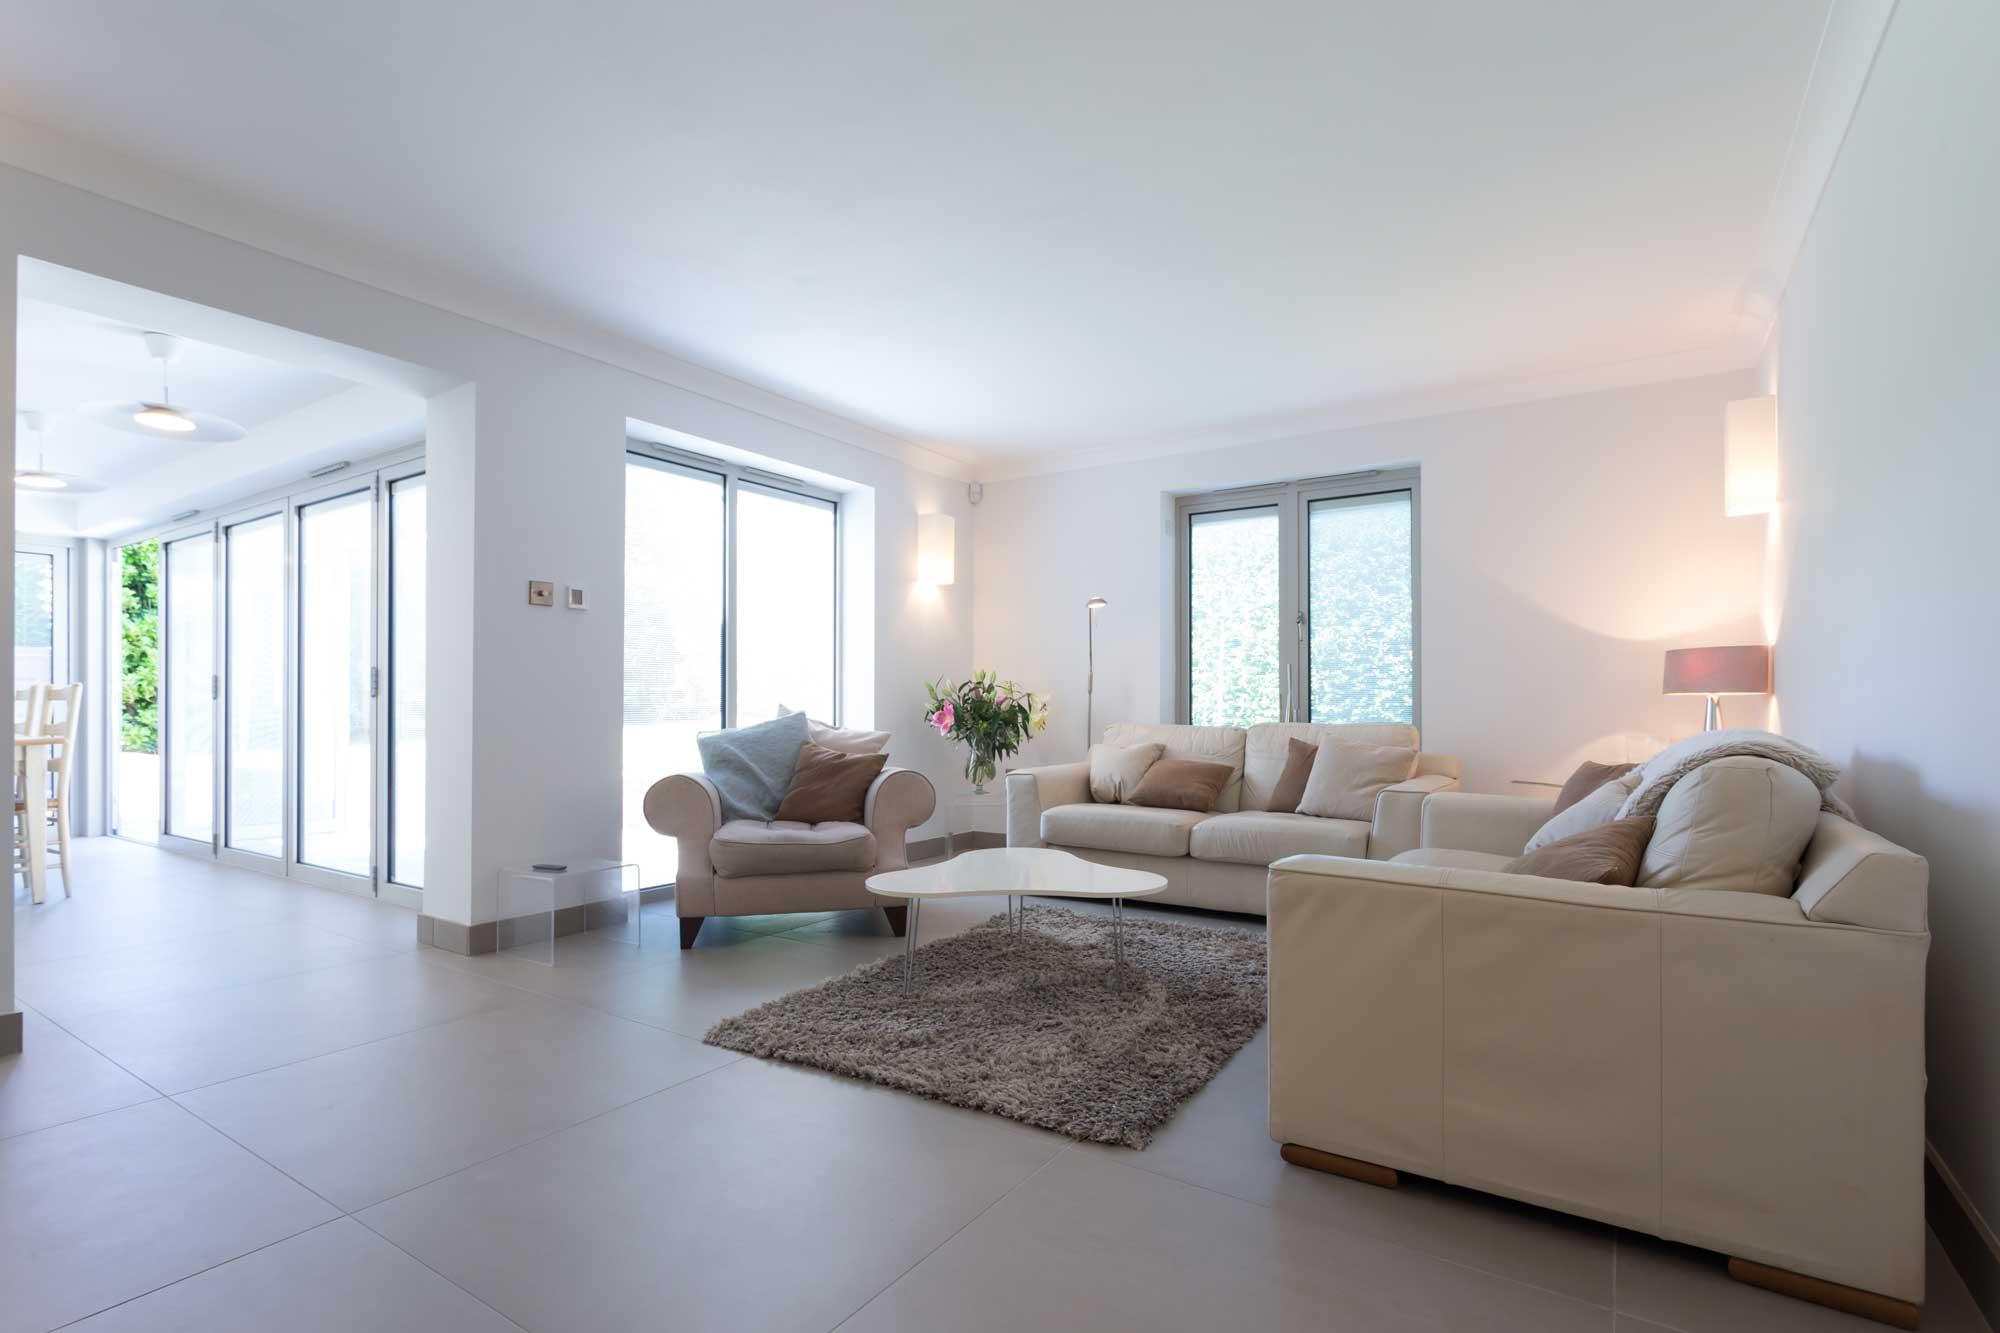 modern white lounge living room sofa large windows